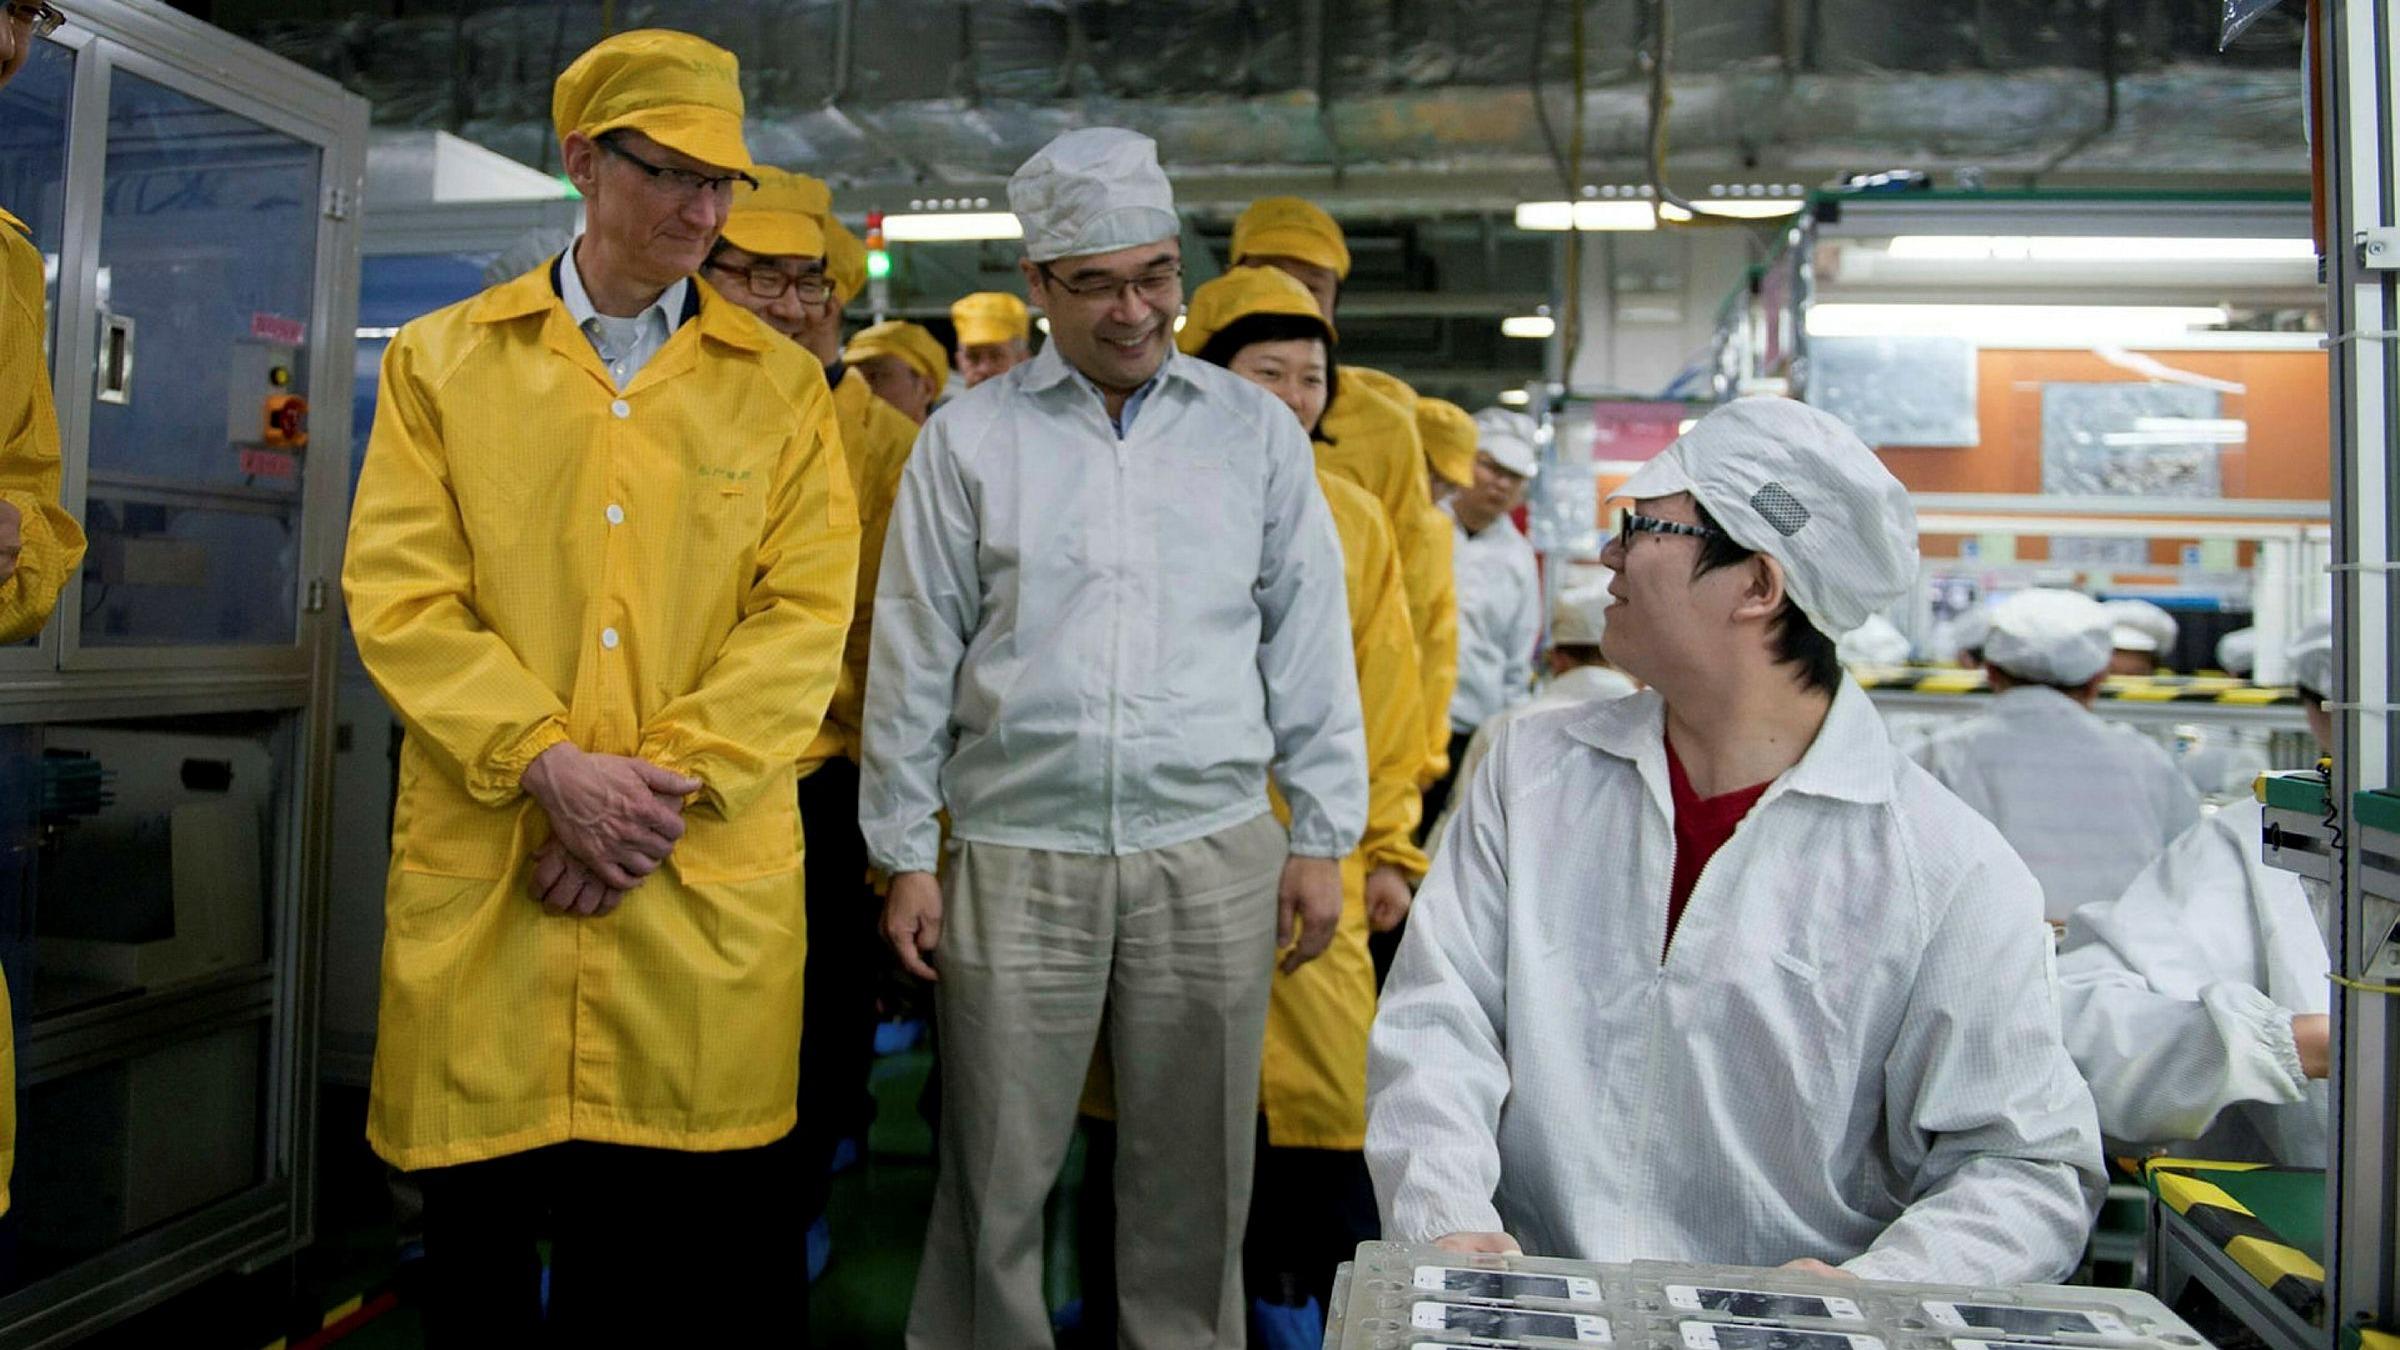 tim_cook_factory